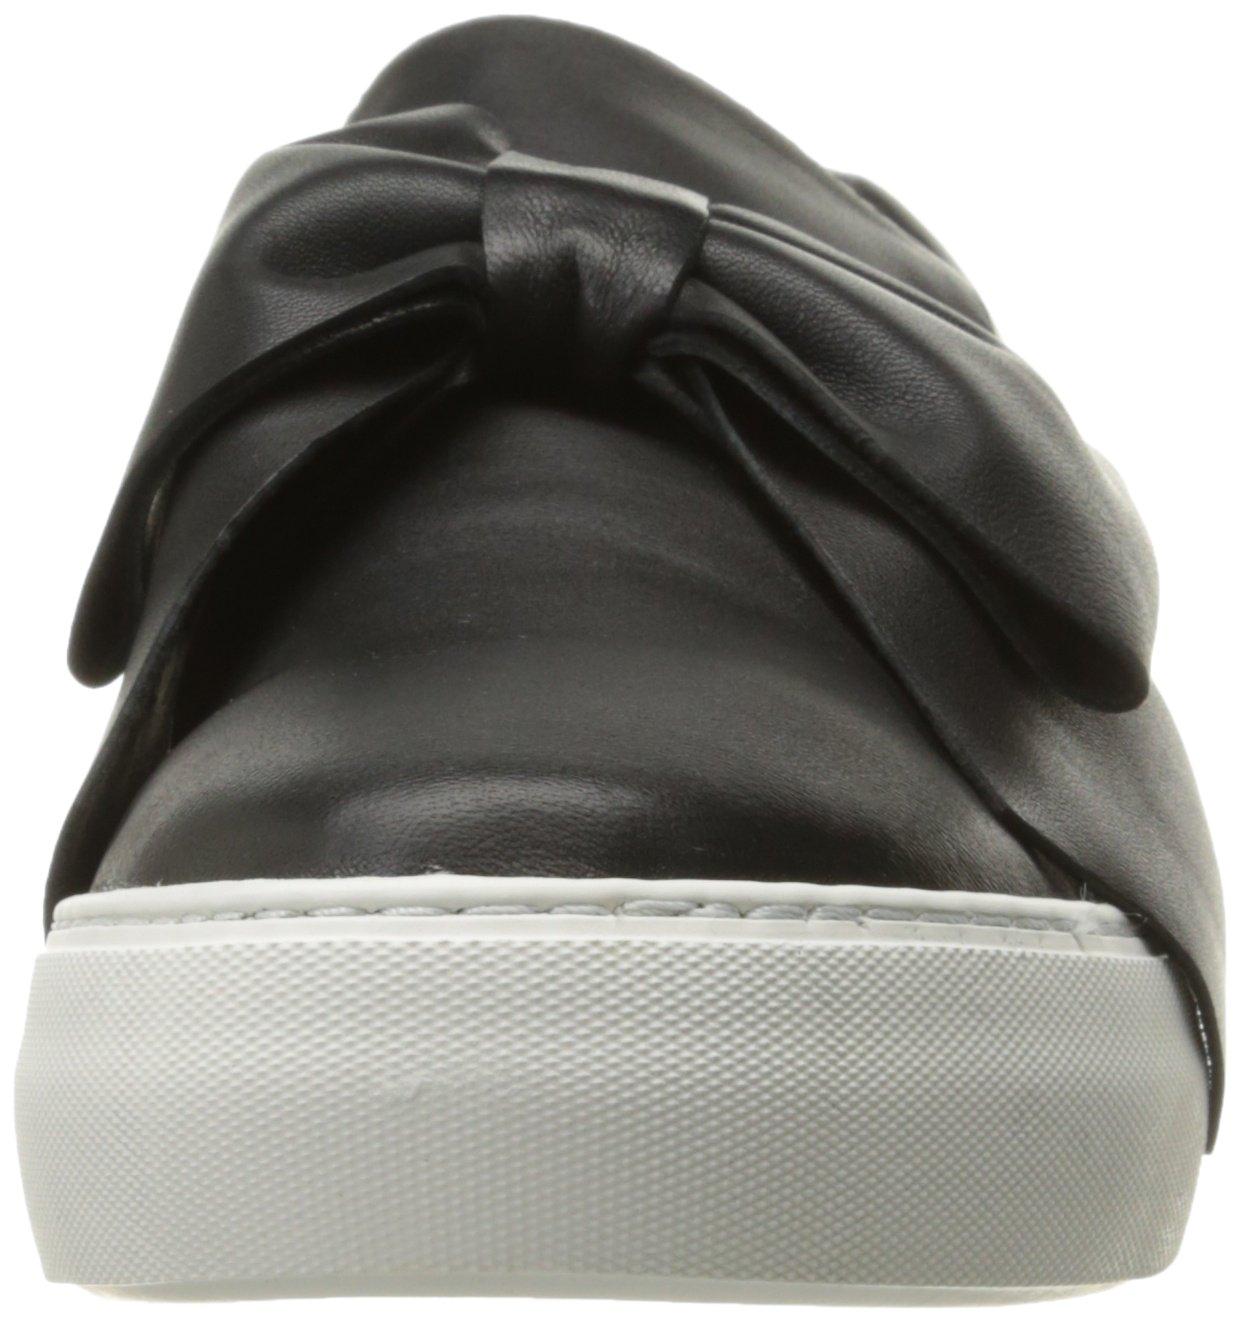 J Slides Women's Beauty B(M) Fashion Sneaker B01M6WQ893 7 B(M) Beauty US|Black Leather a12f95